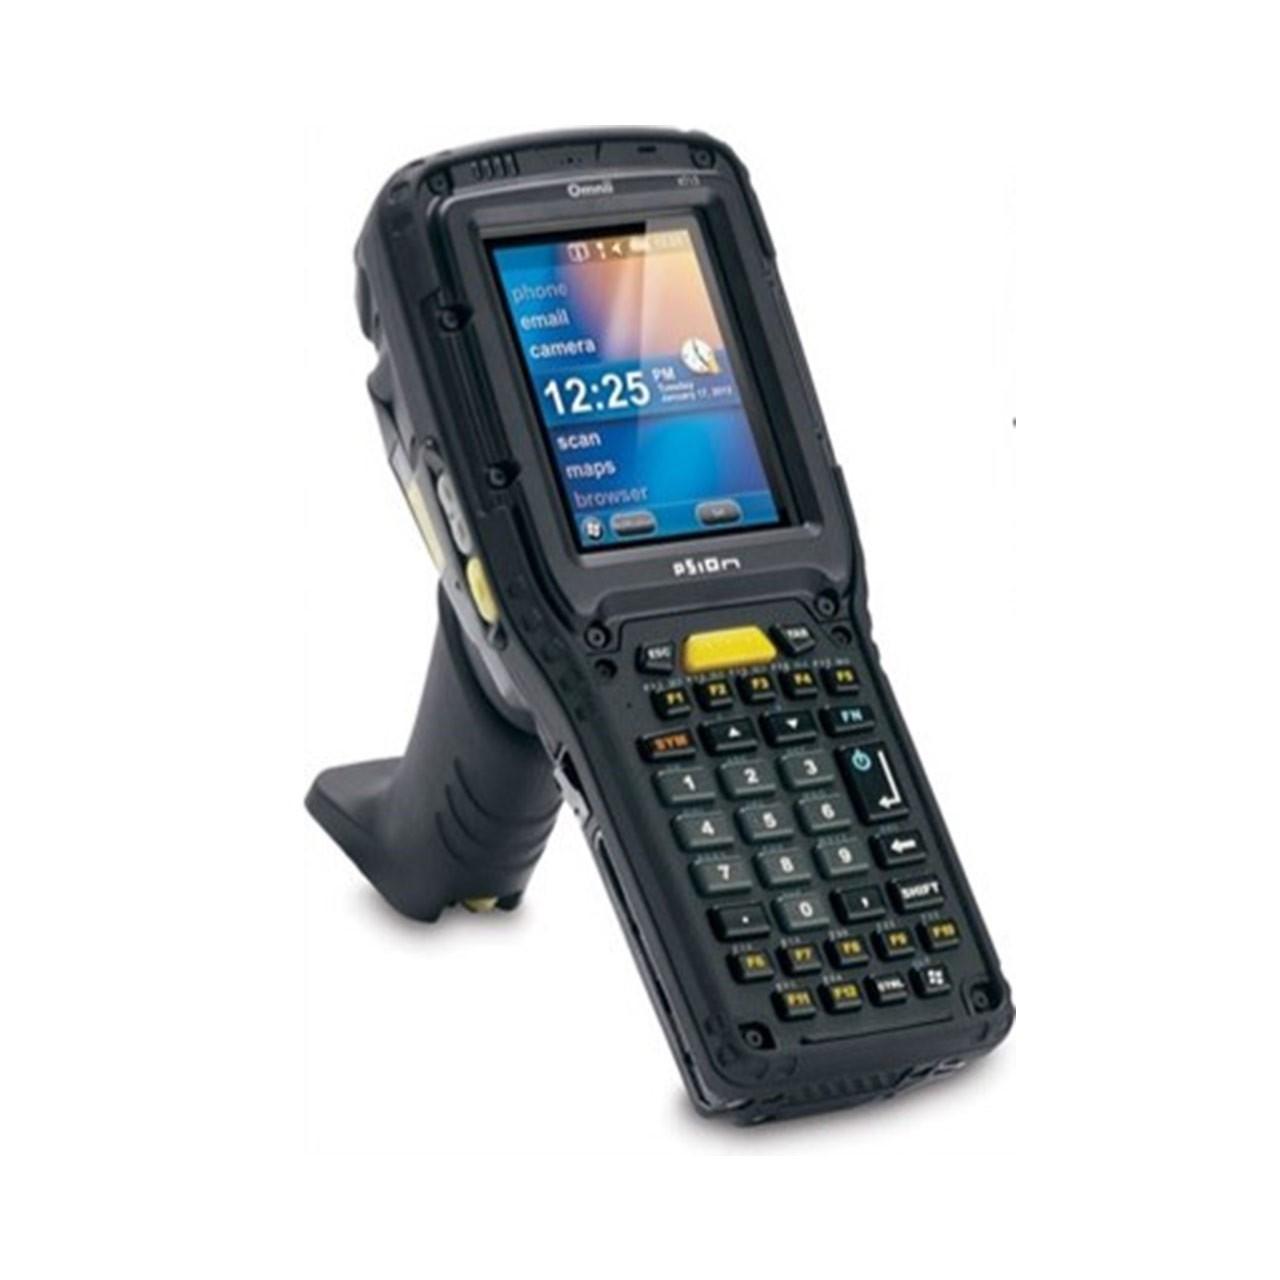 omnii-xt15-mobile-computer-ob1311e0500a1102-684